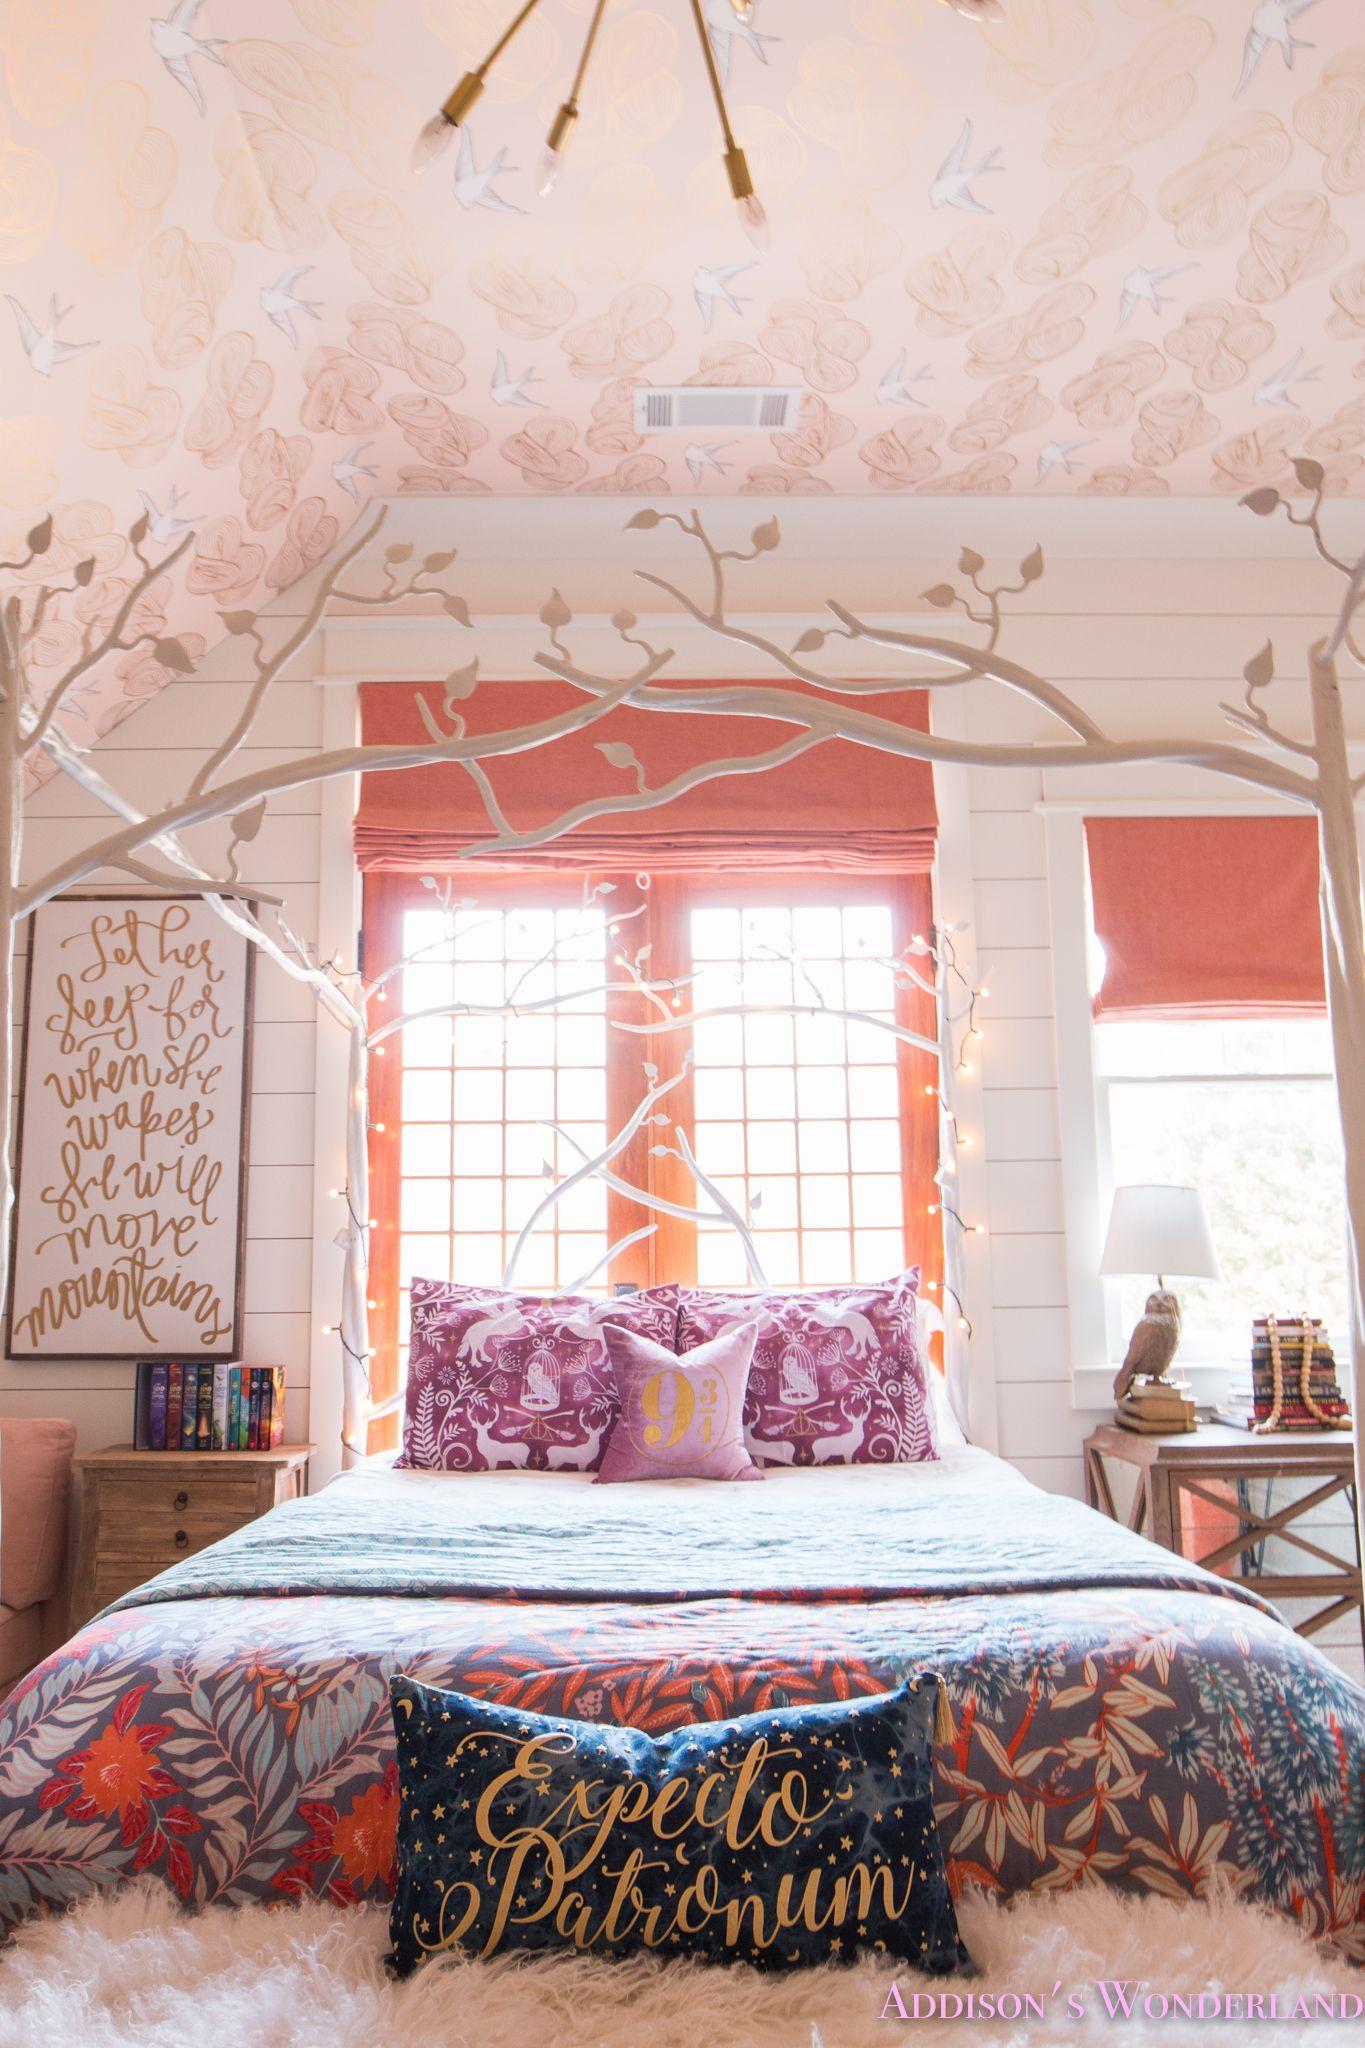 Harry Potter Themed S Bed Bedroom Decor Design